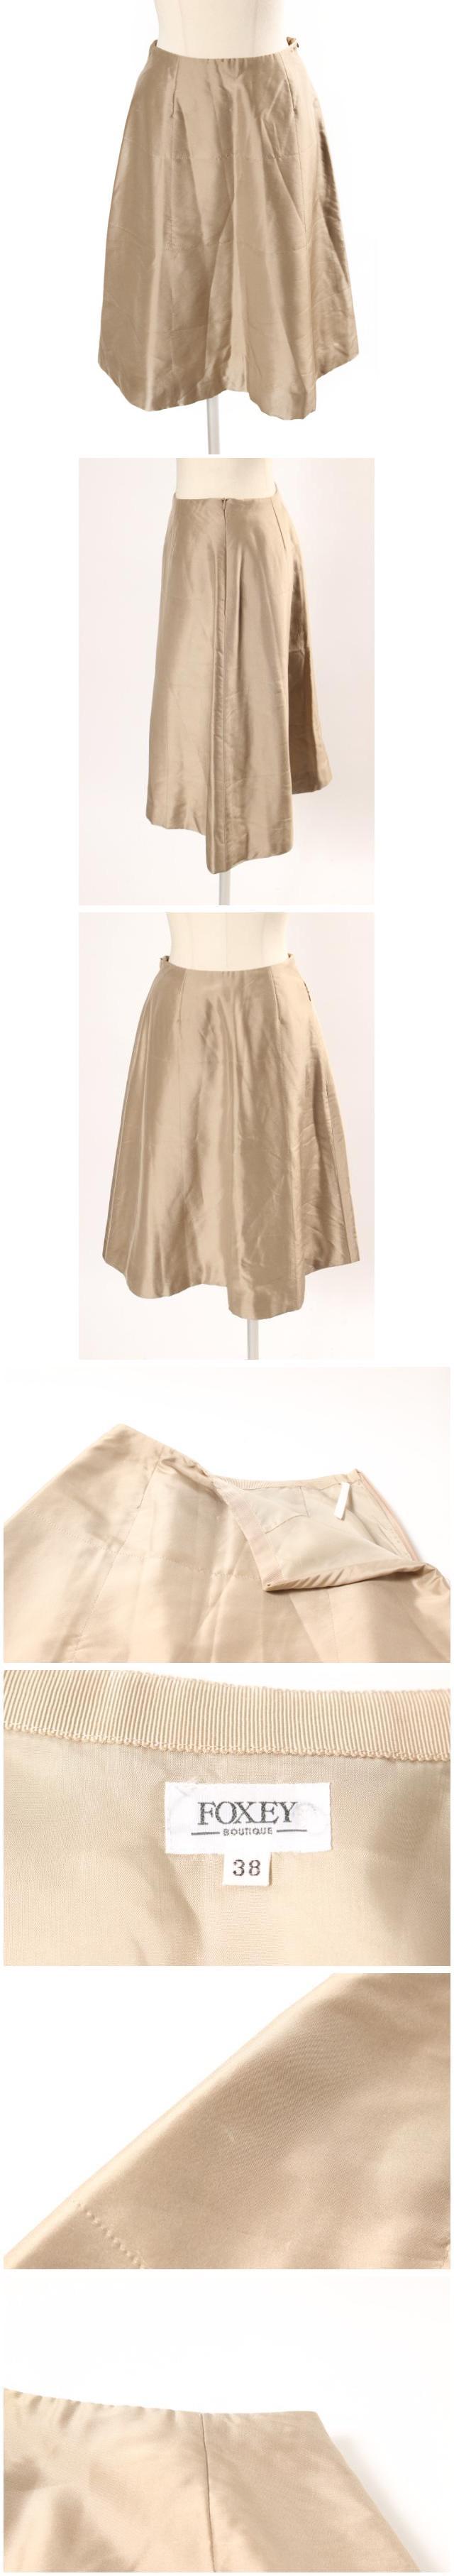 BOUTIQUE スカート ミモレ ロング フレア シルク 38 ベージュ 18474 /mm0503